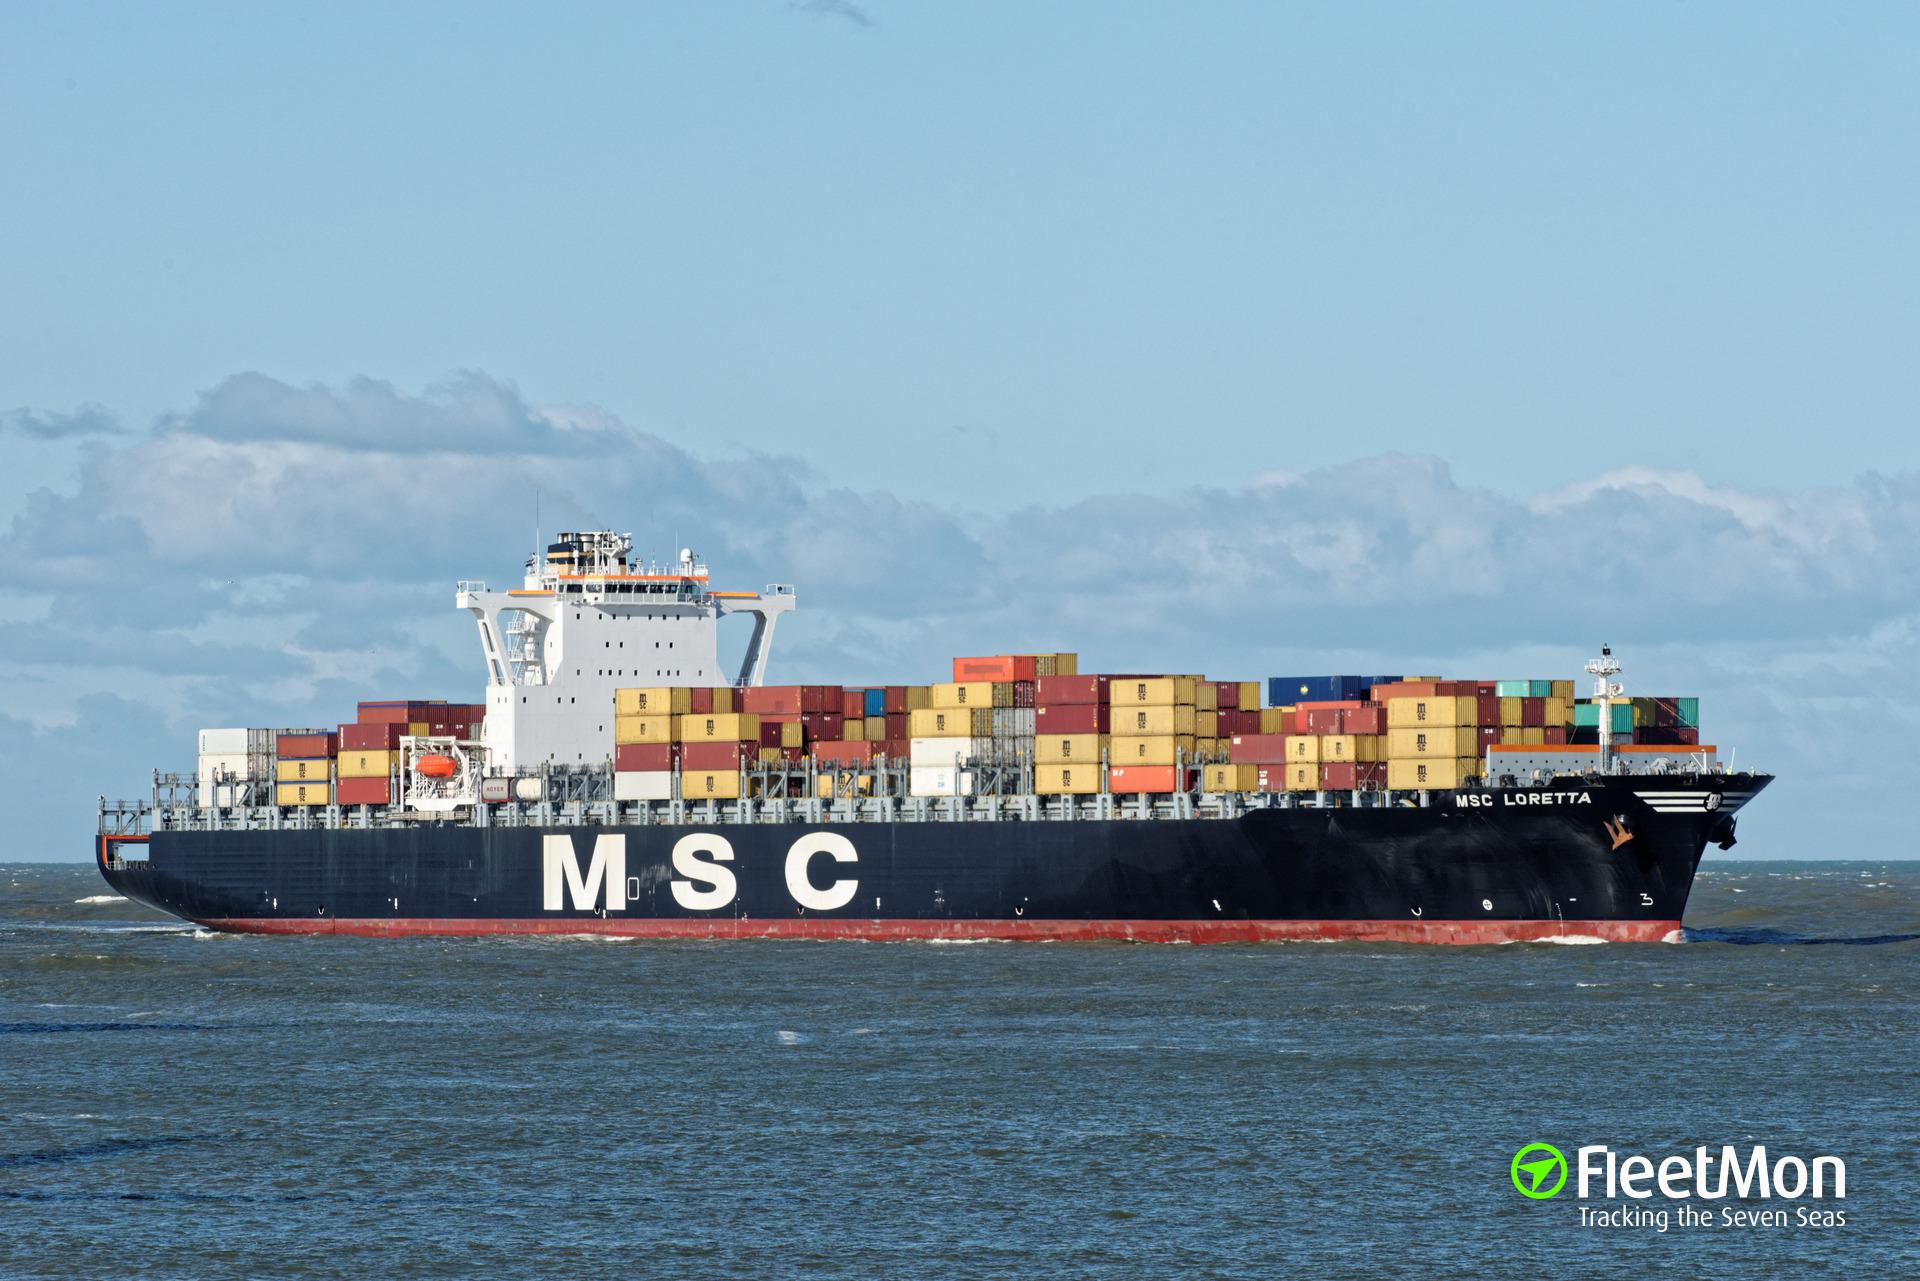 Drugs found on board of MSC Loretta